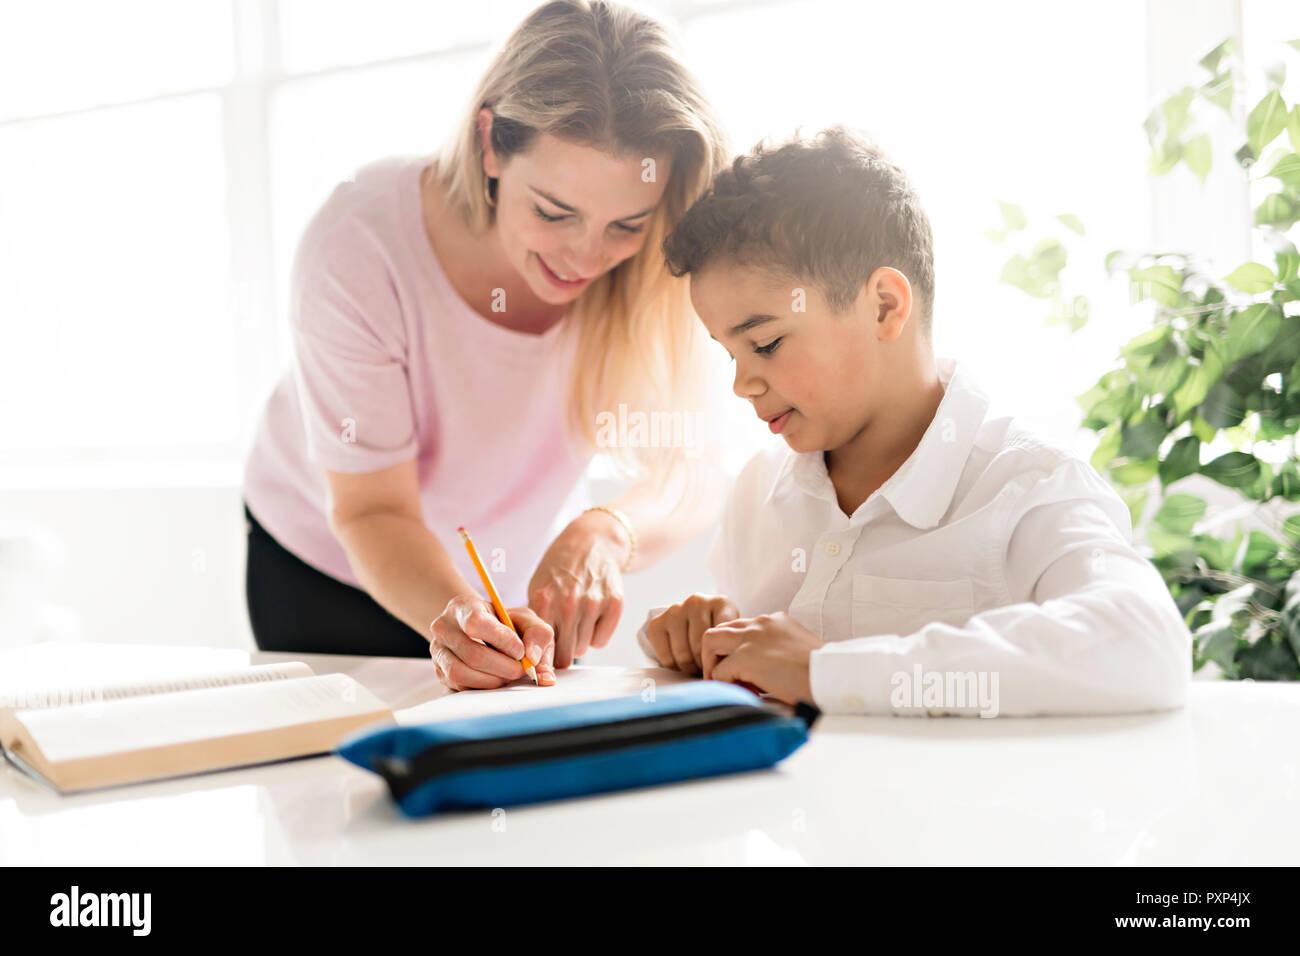 mother help black boy doing homework at home stock photo 222992082 rh alamy com Family Doing Homework Doing Homework at Lunch